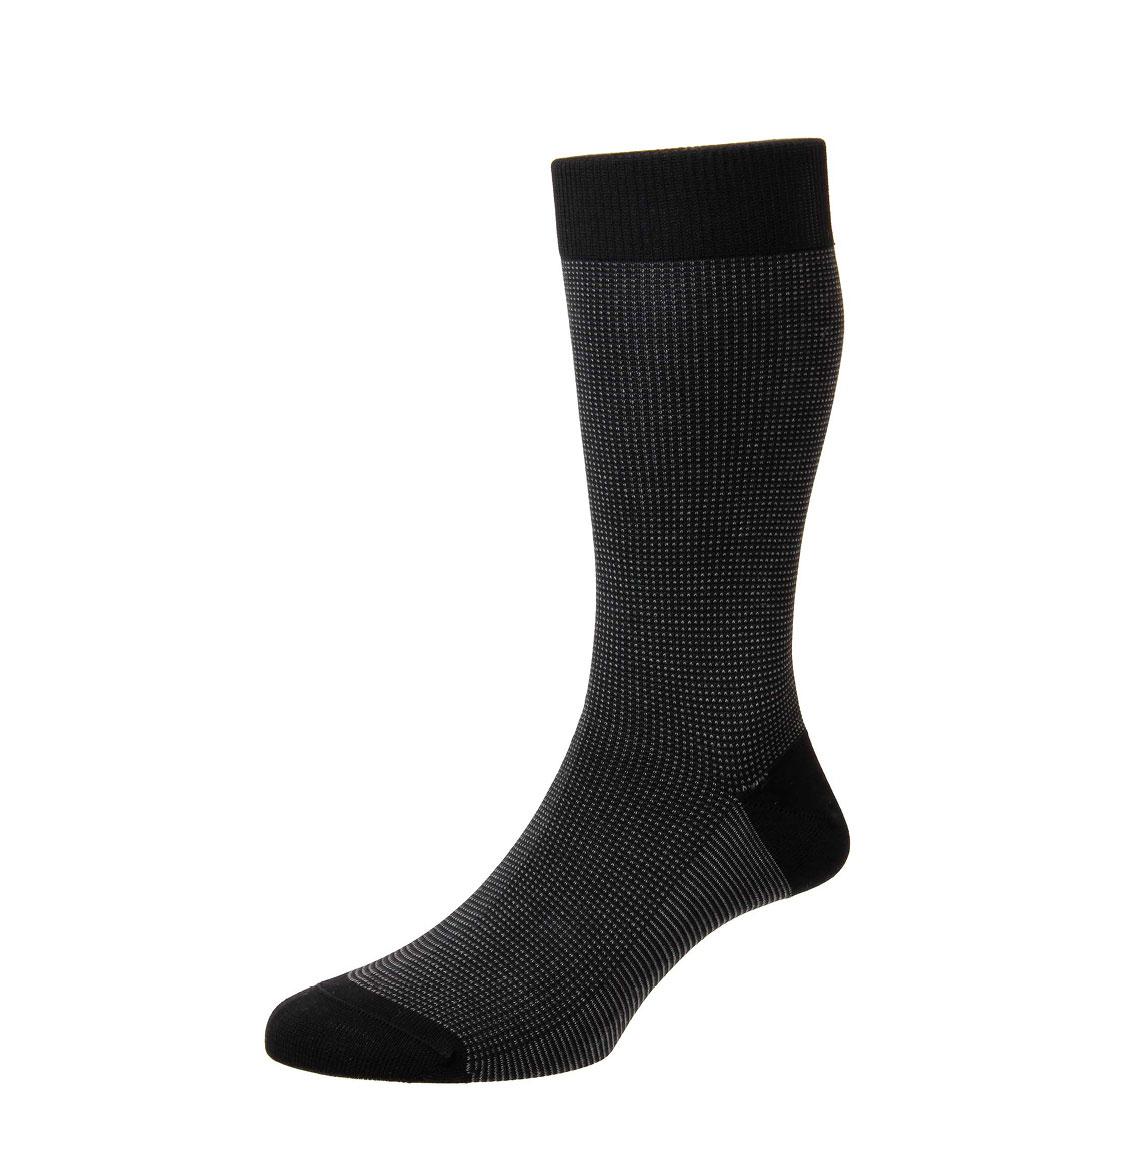 Pantherella Socks Tewkesbury Birdseye Black